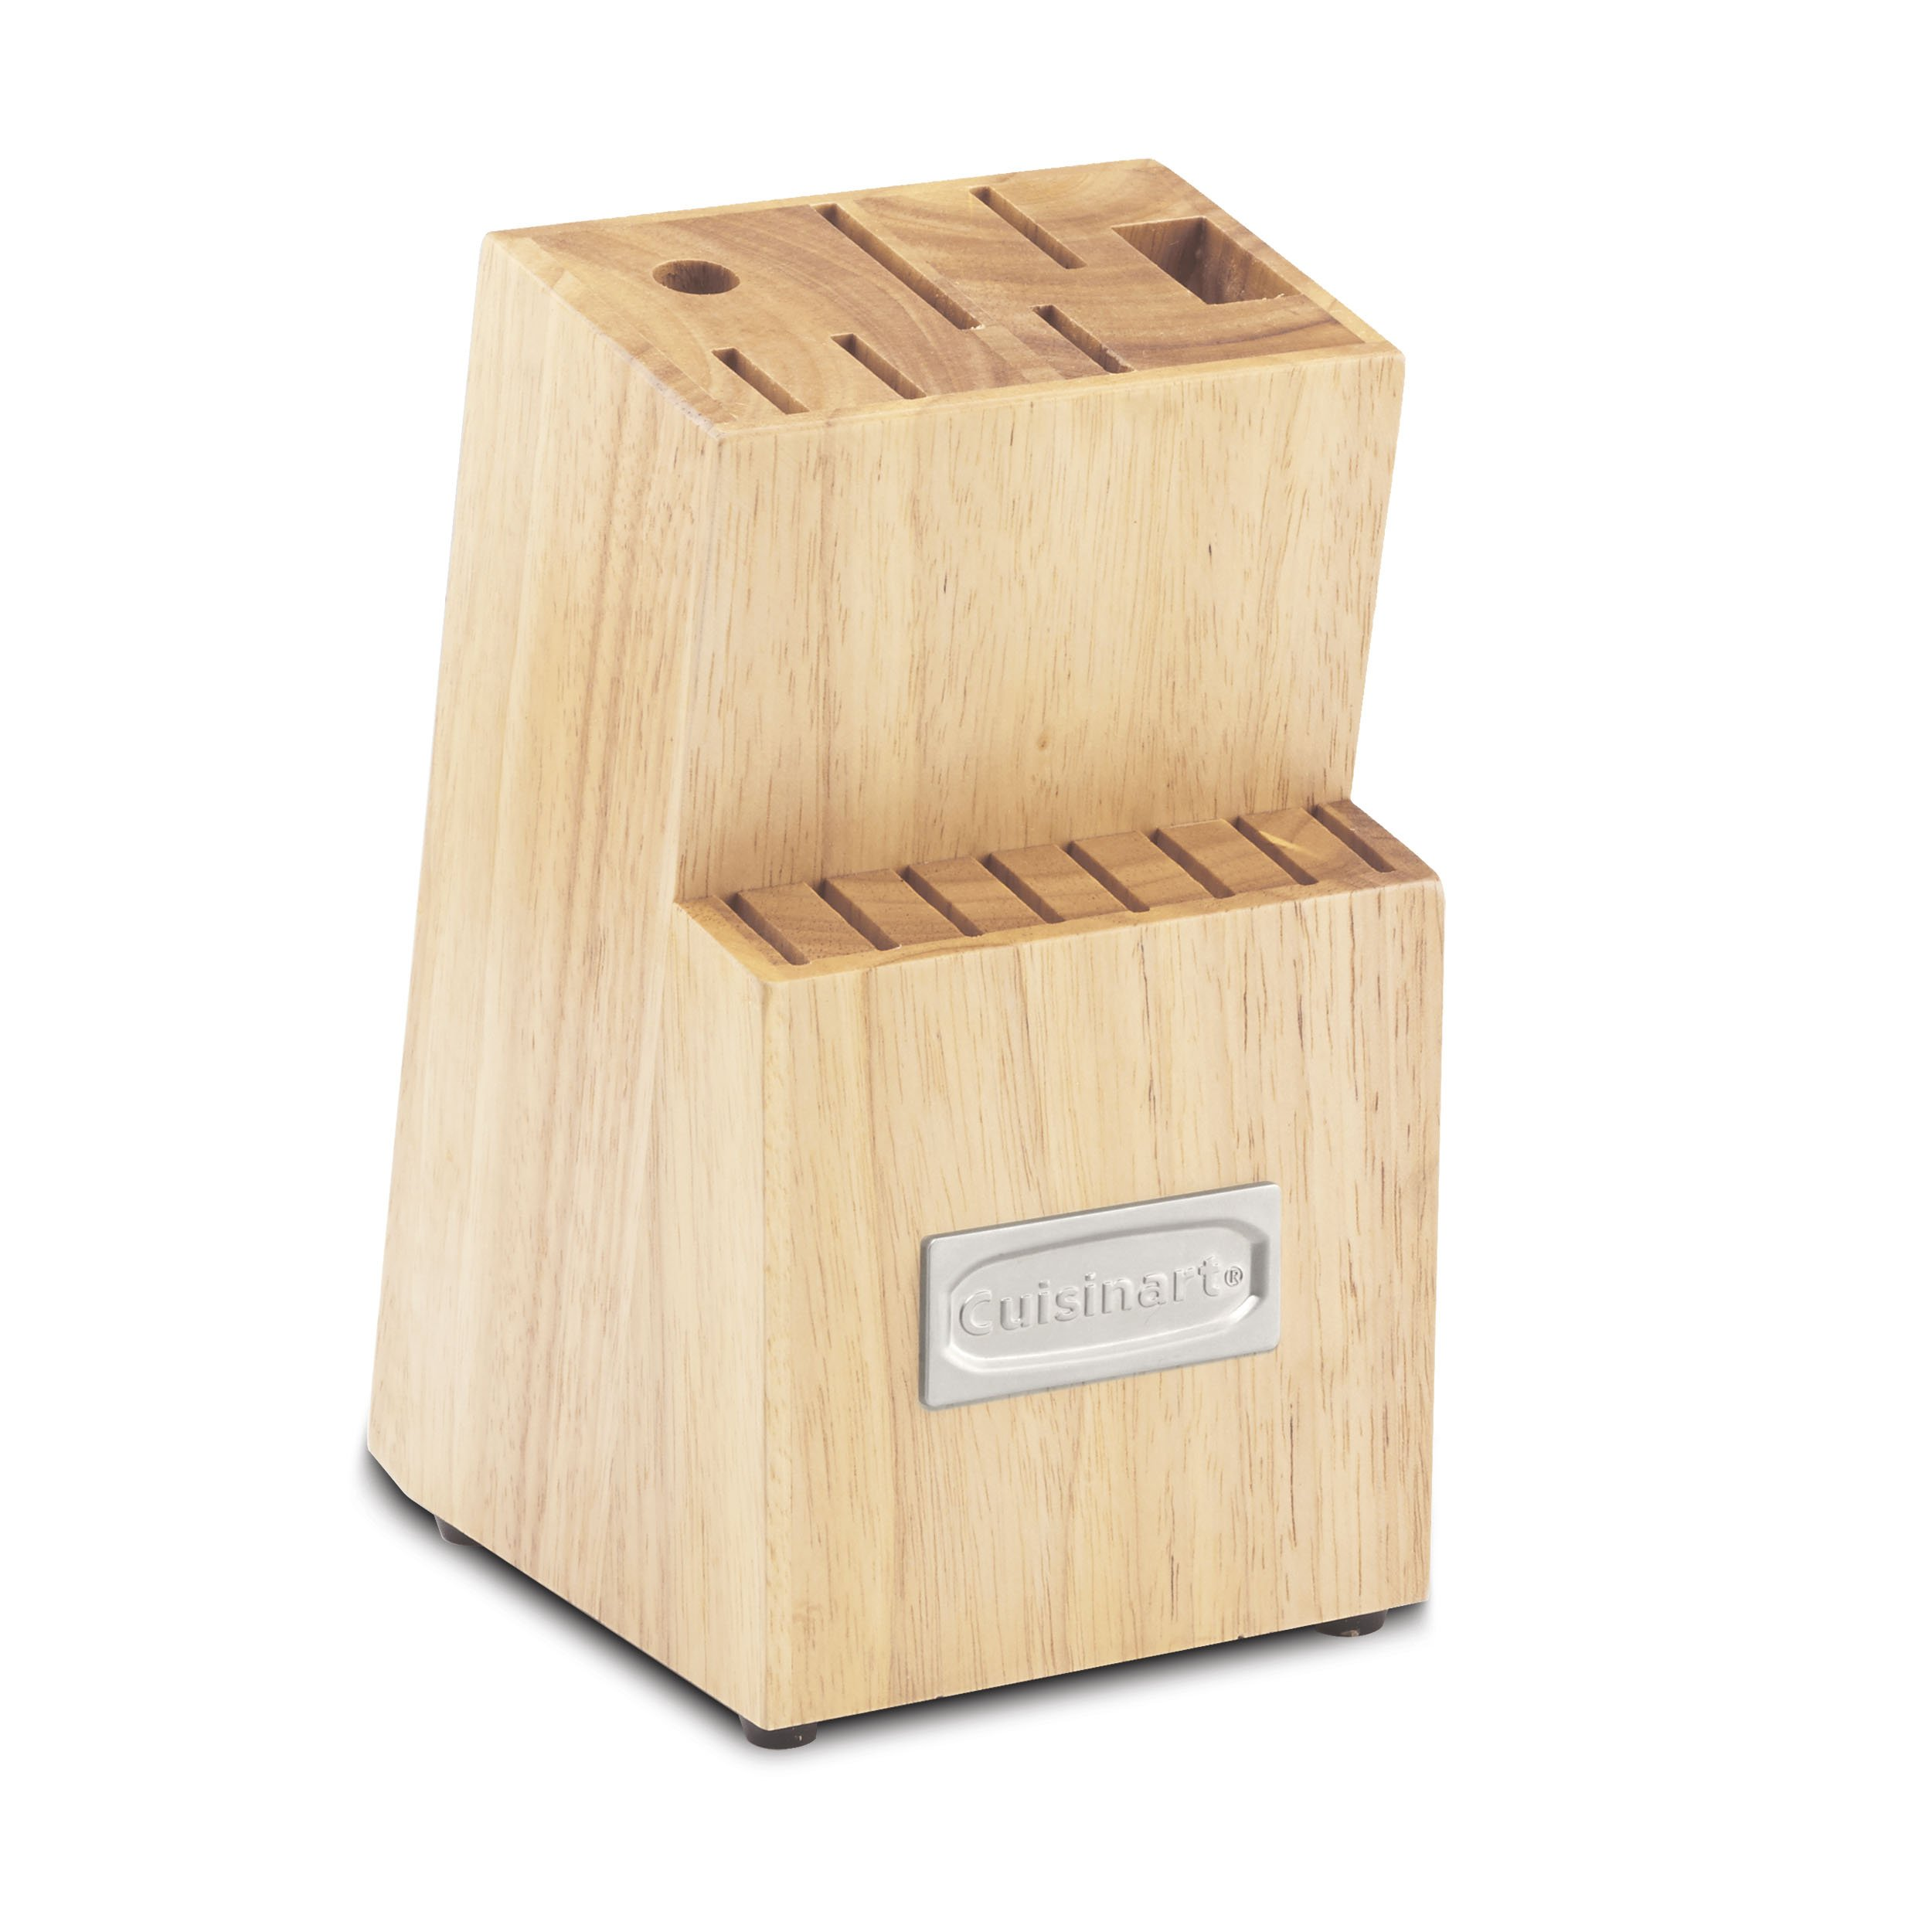 Cuisinart C77TR-14BLK Triple Rivet Collection 14-Slot Cutlery Block, Natural Wood